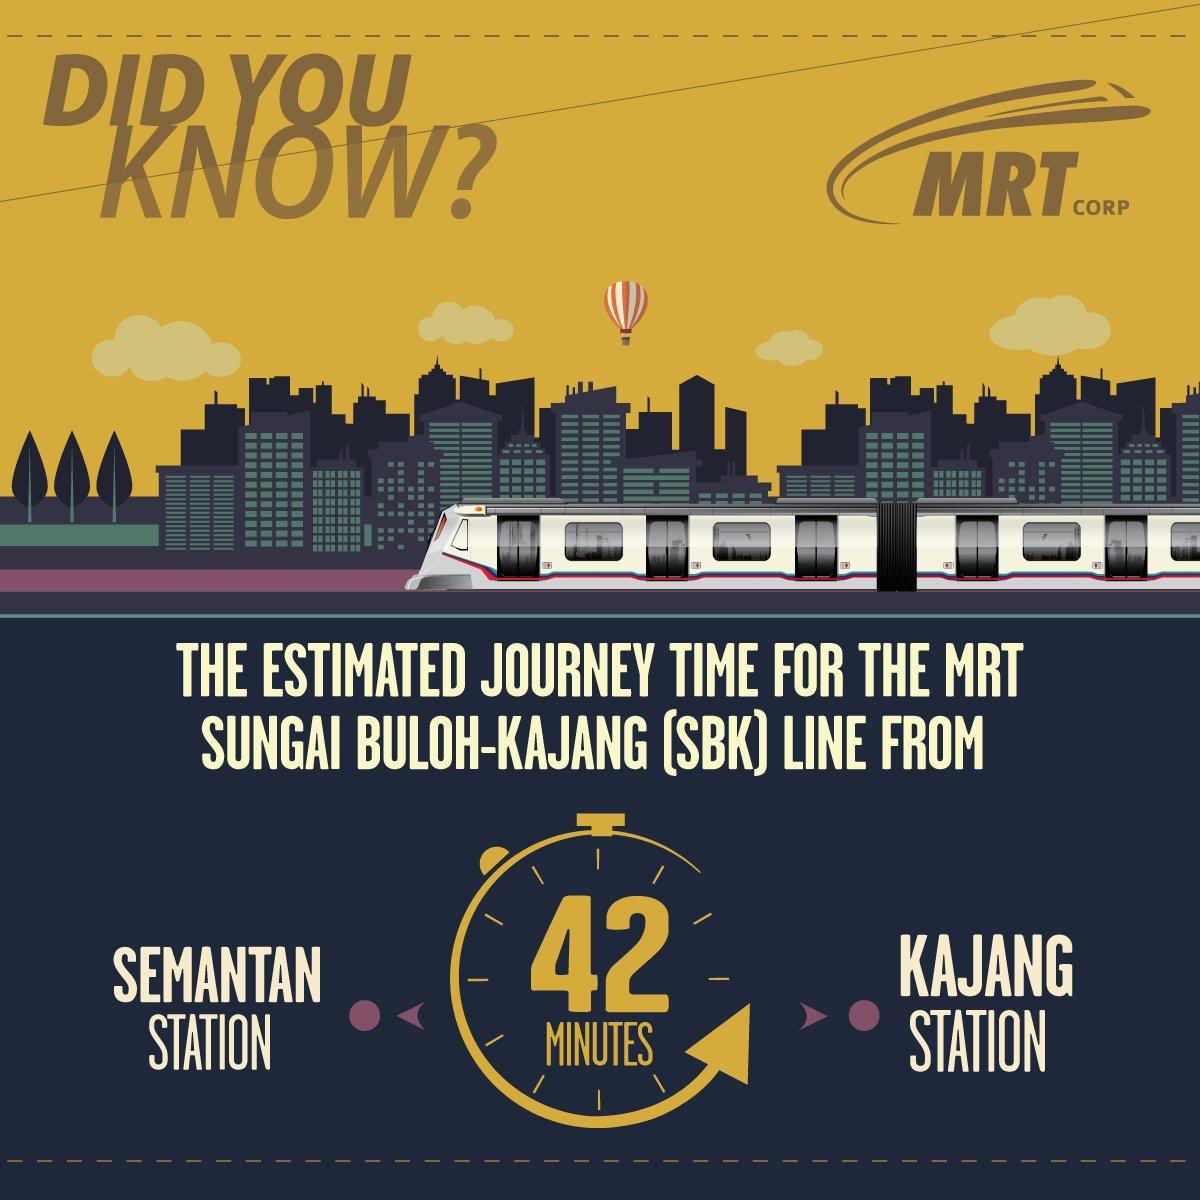 MRT Sungai Buloh - Kajang (SBK) Line 17.7.17 #JomNaikMRT